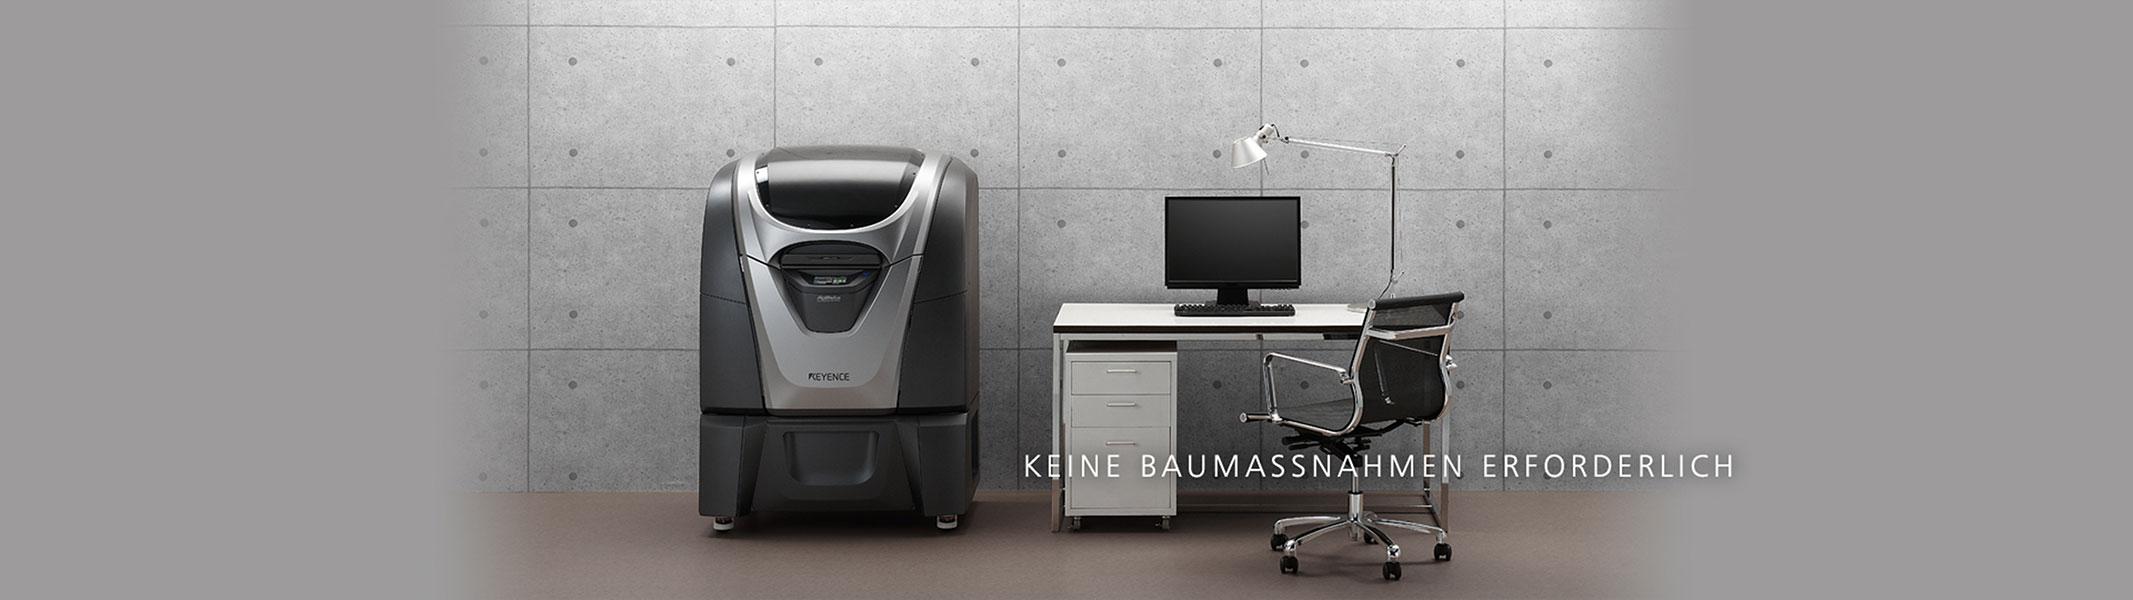 Agilista 3100 Keyence - 3D printers